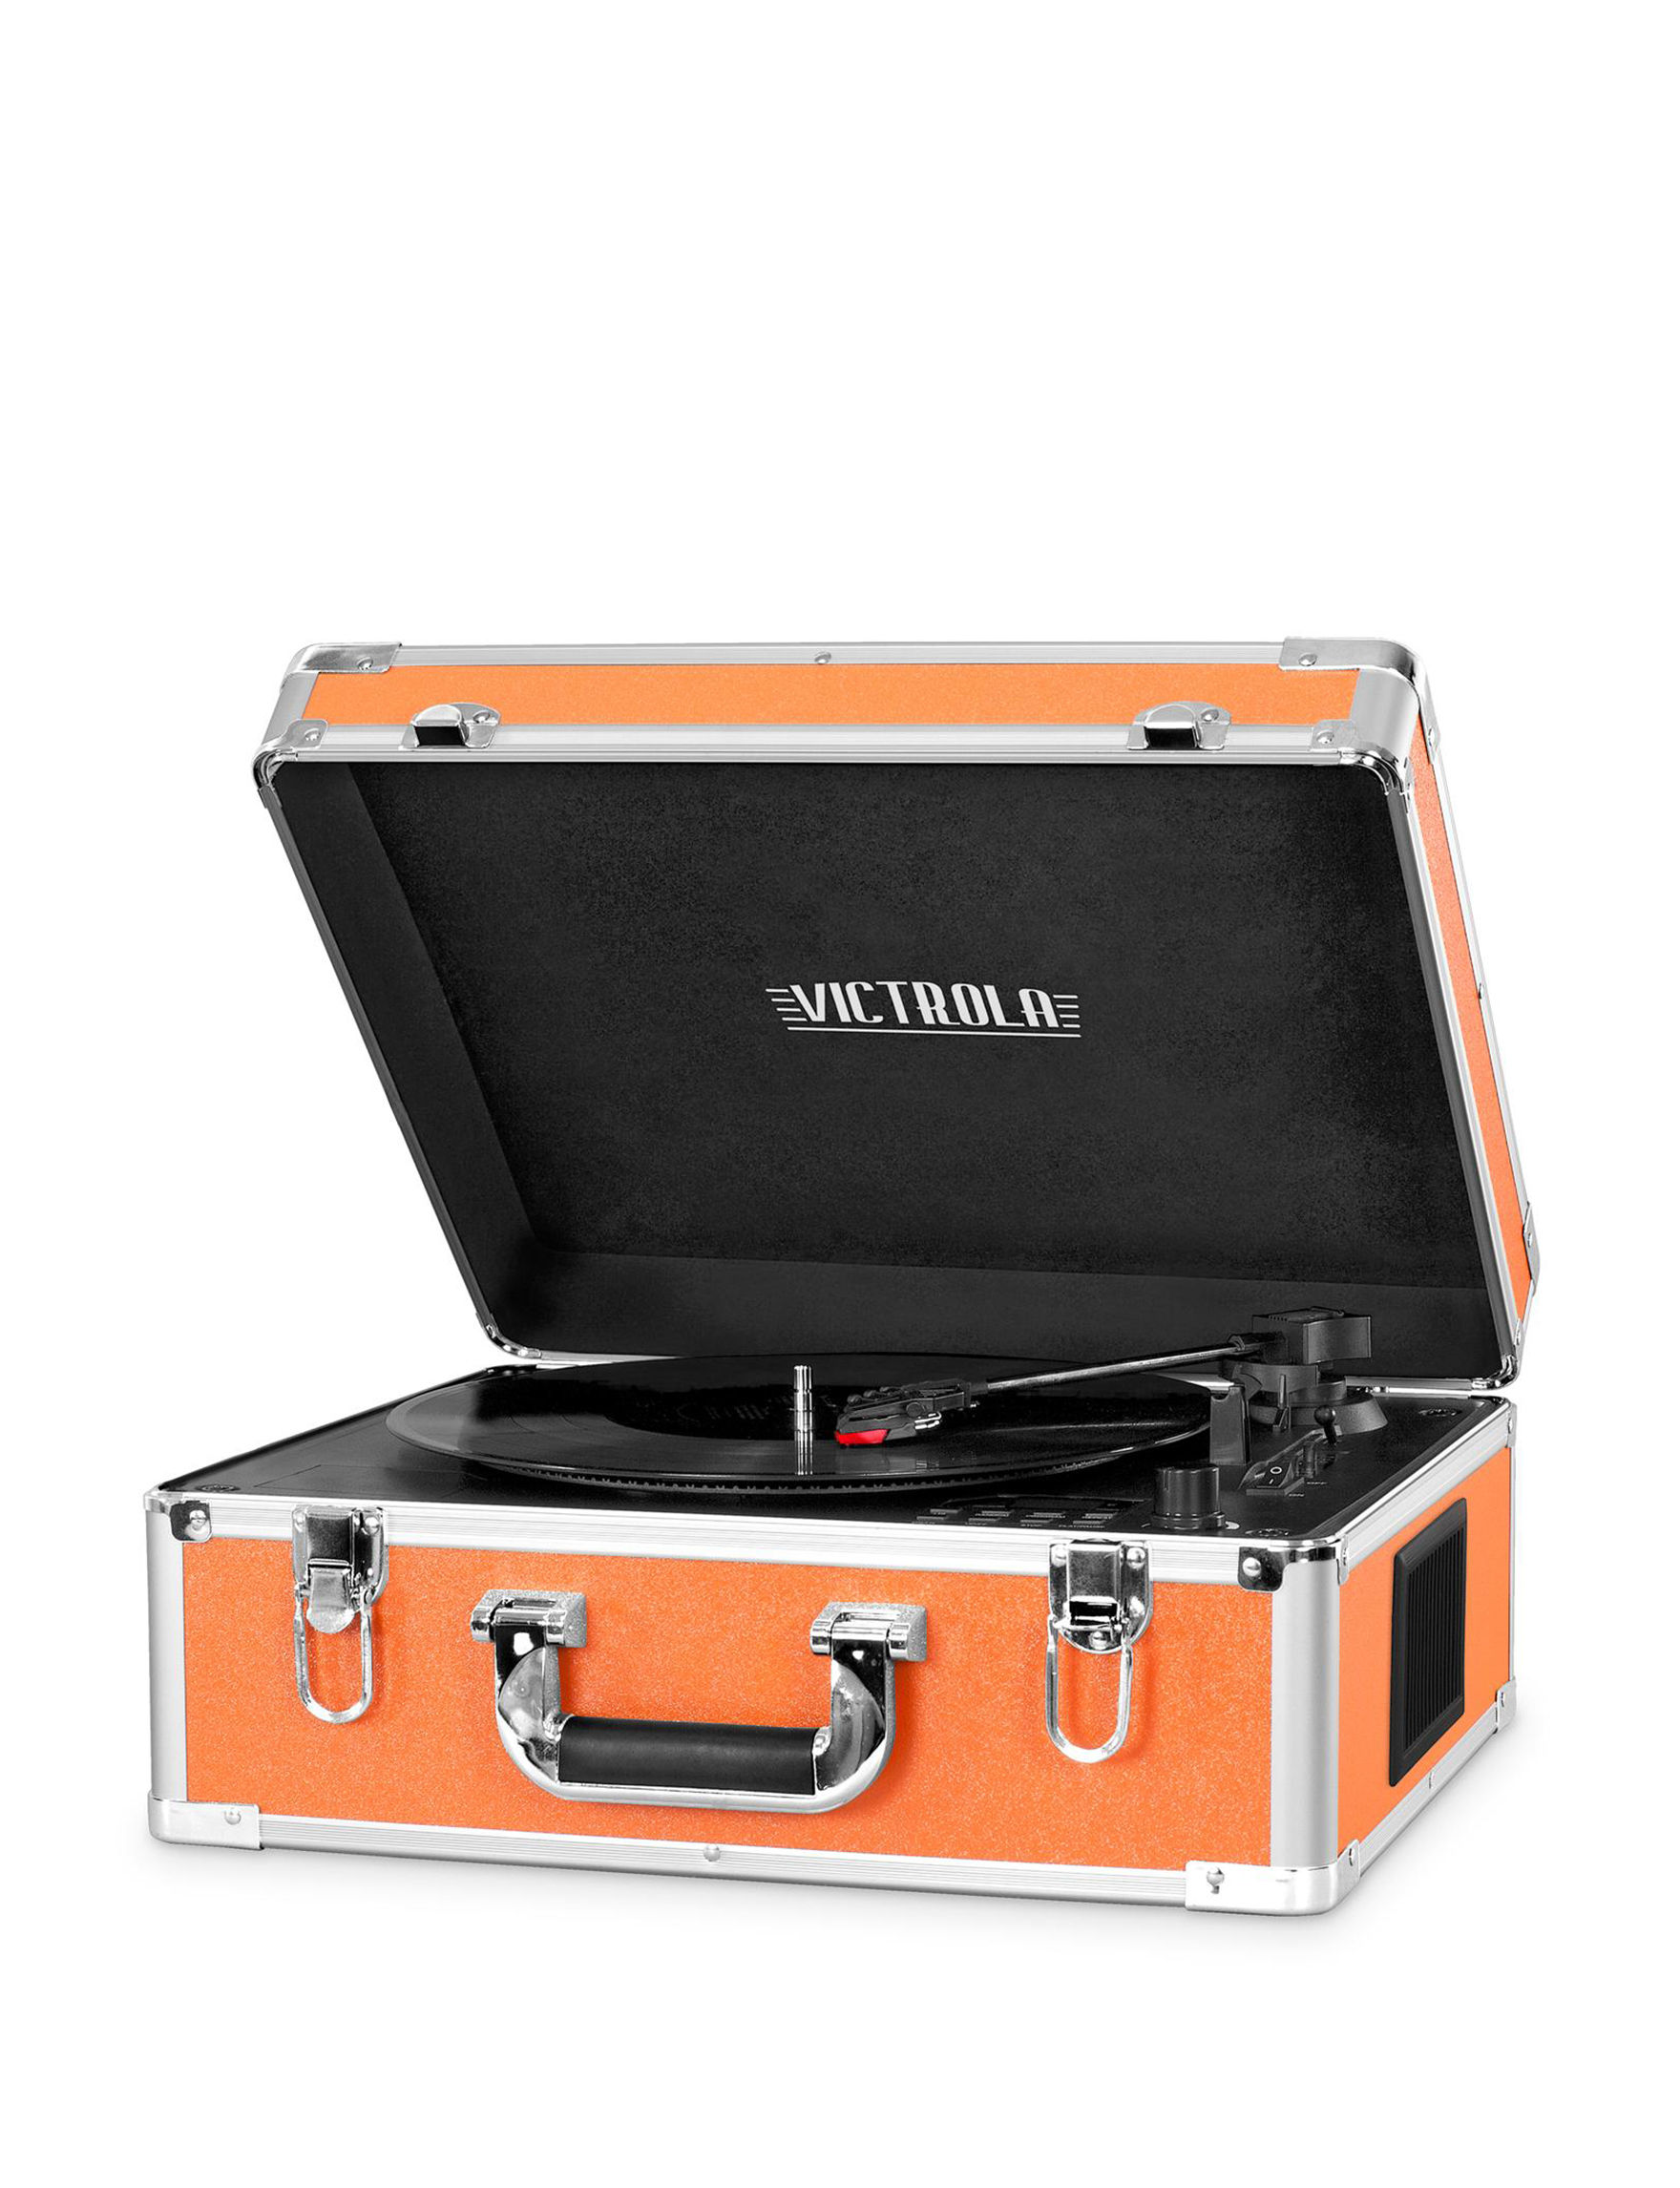 Victrola Orange Speakers & Docks Home & Portable Audio